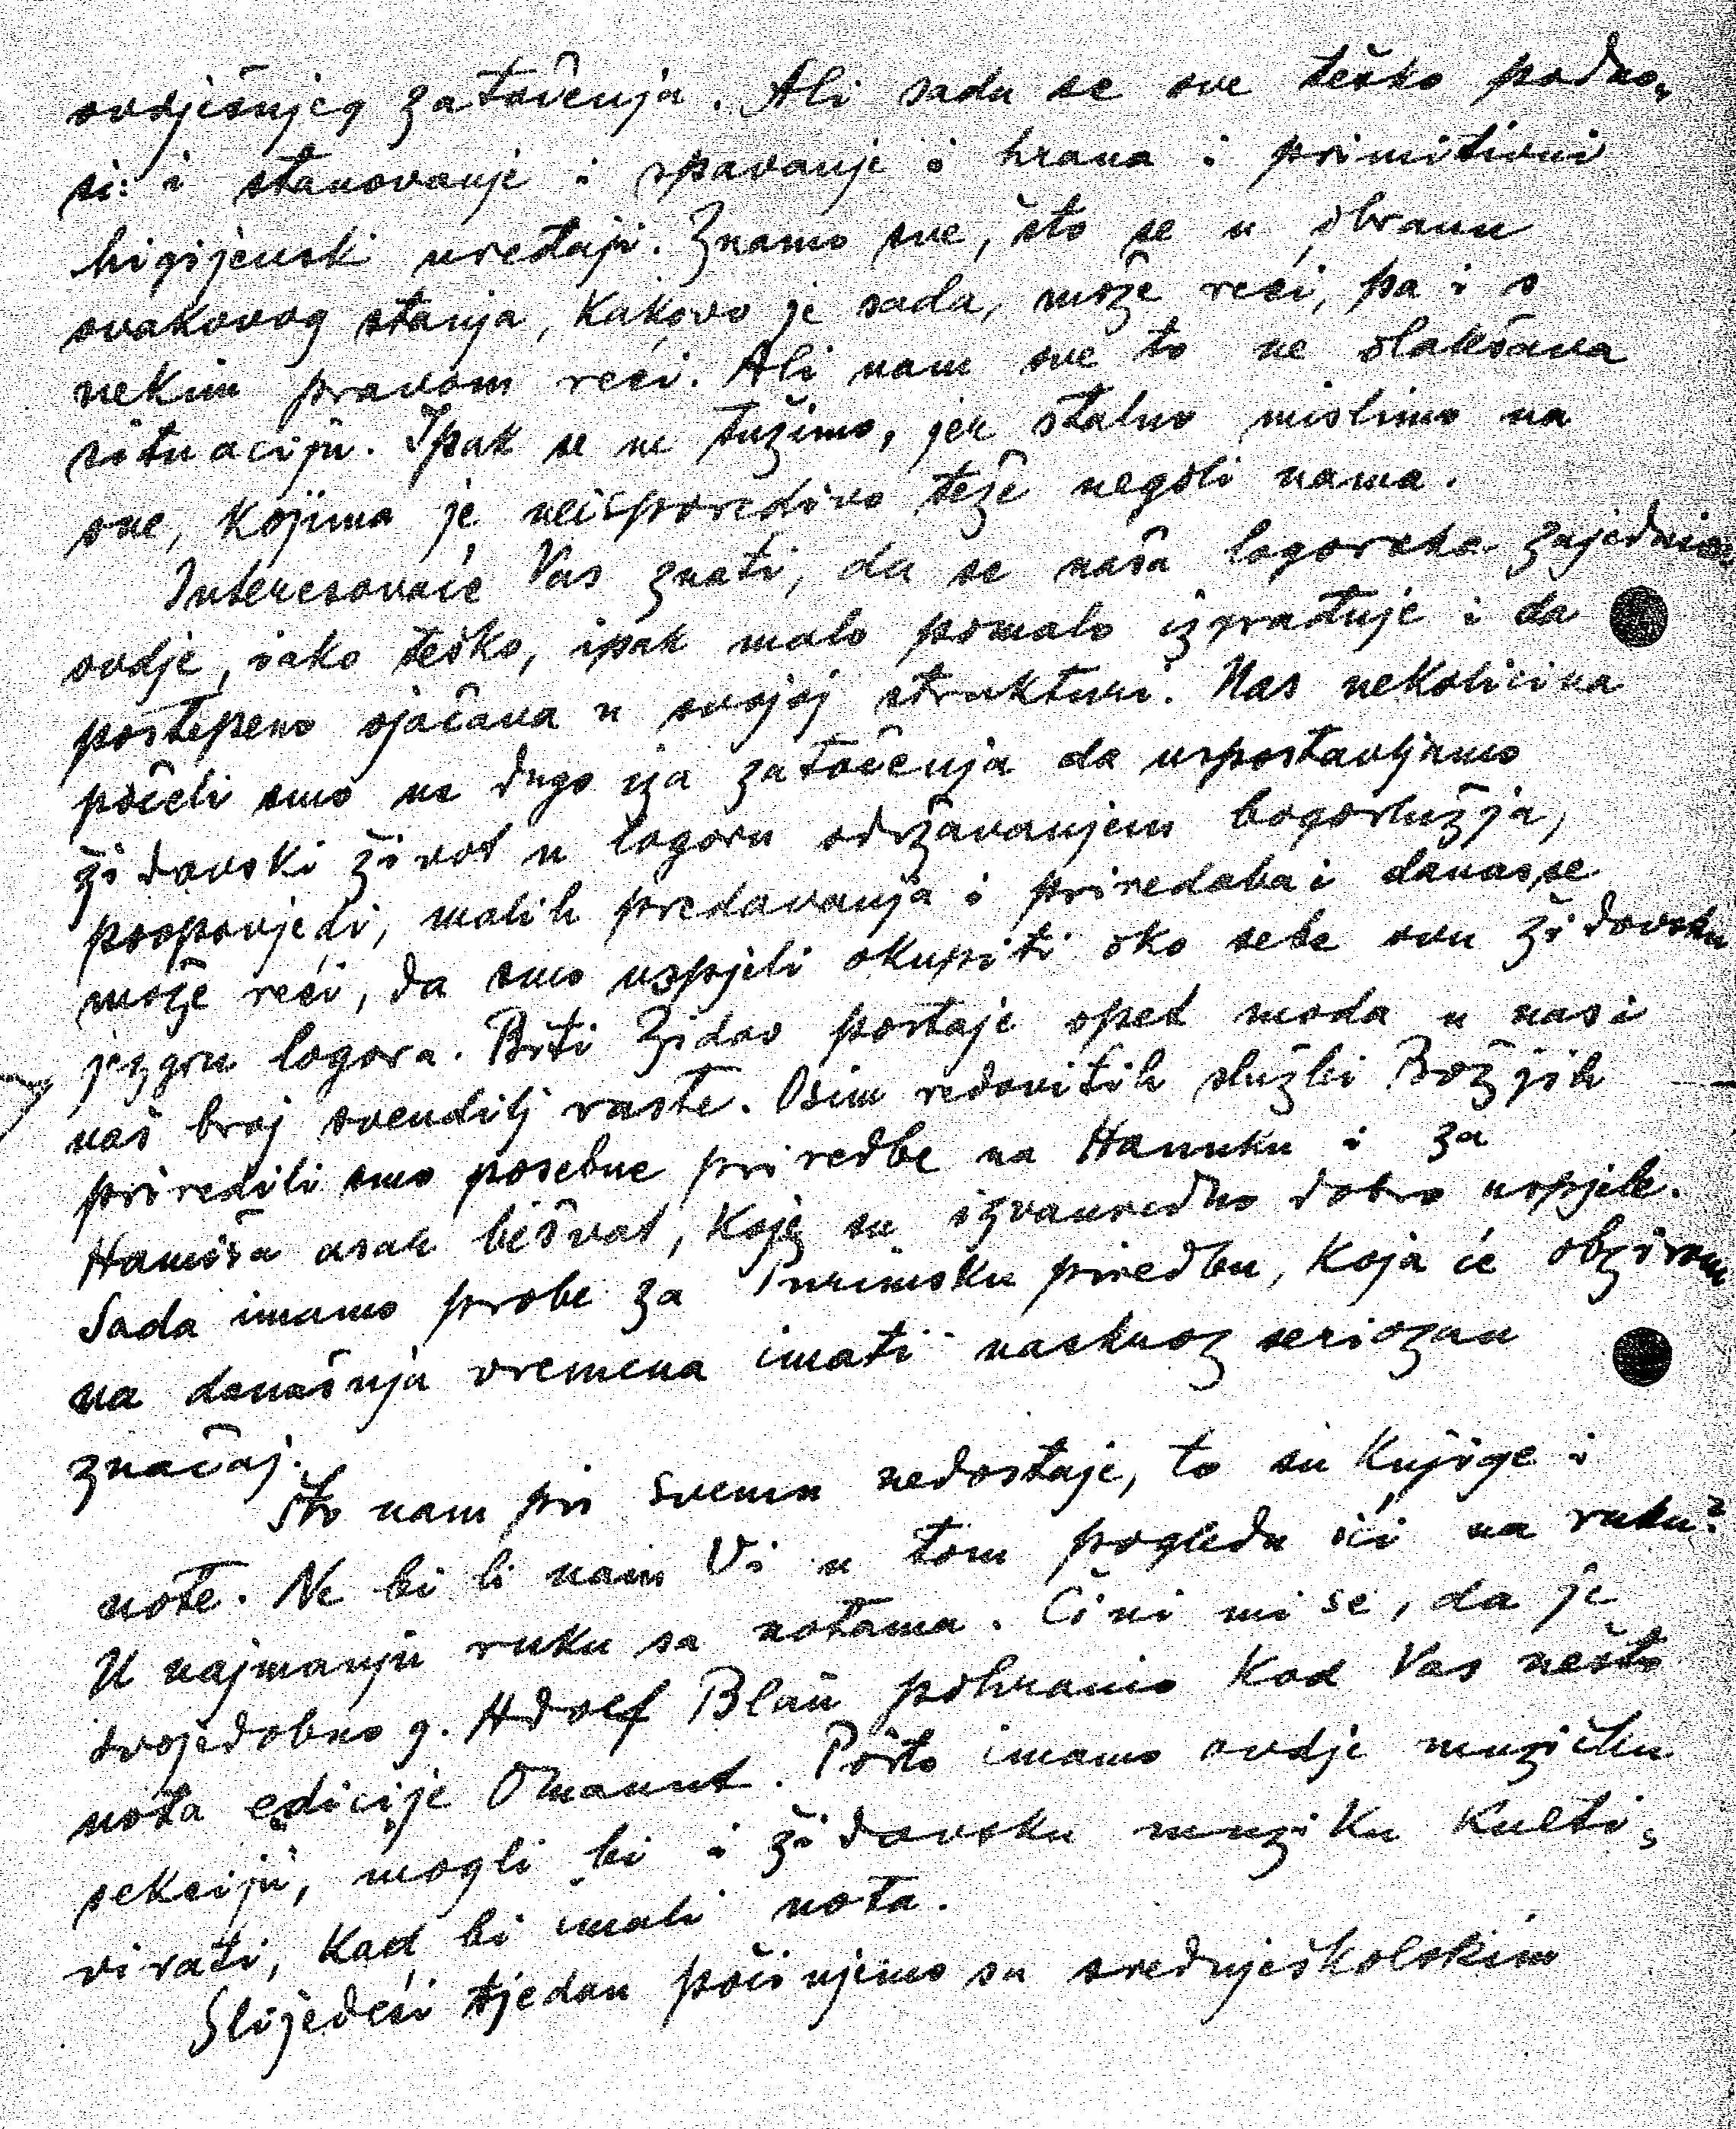 Gottlieb, Hinko letter 1943